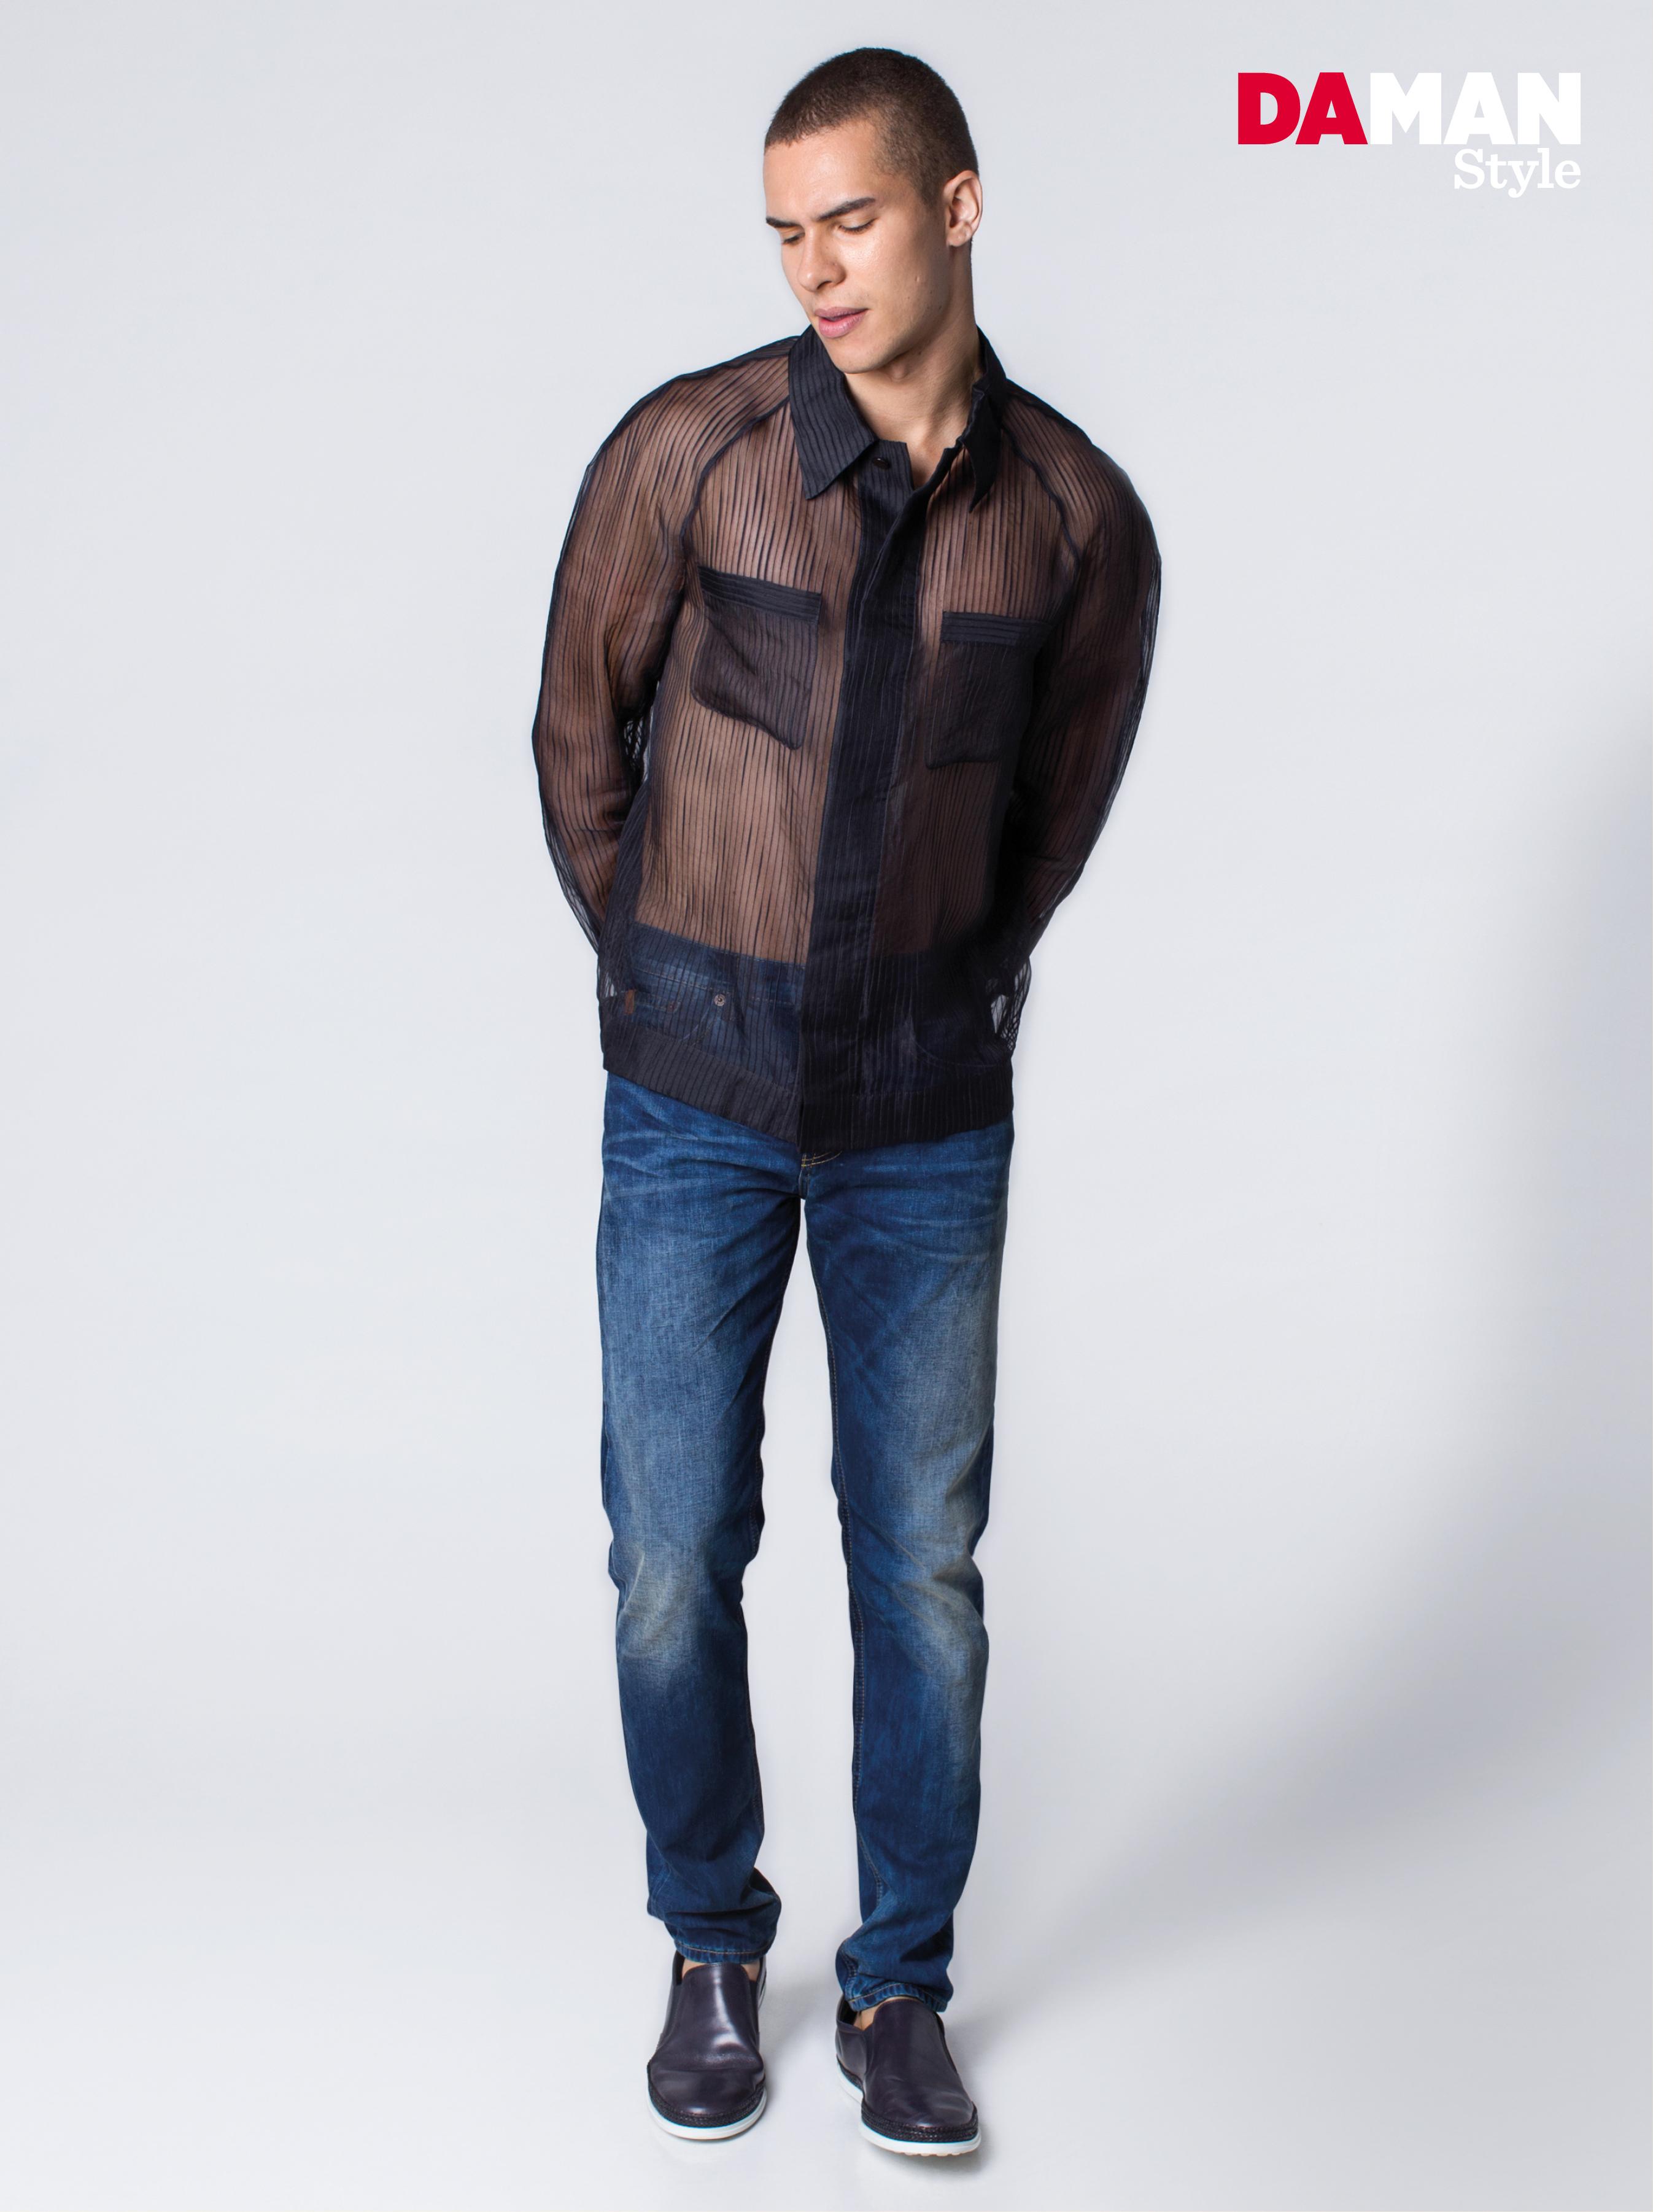 3 ways to wear sheer tops for men   da man magazine